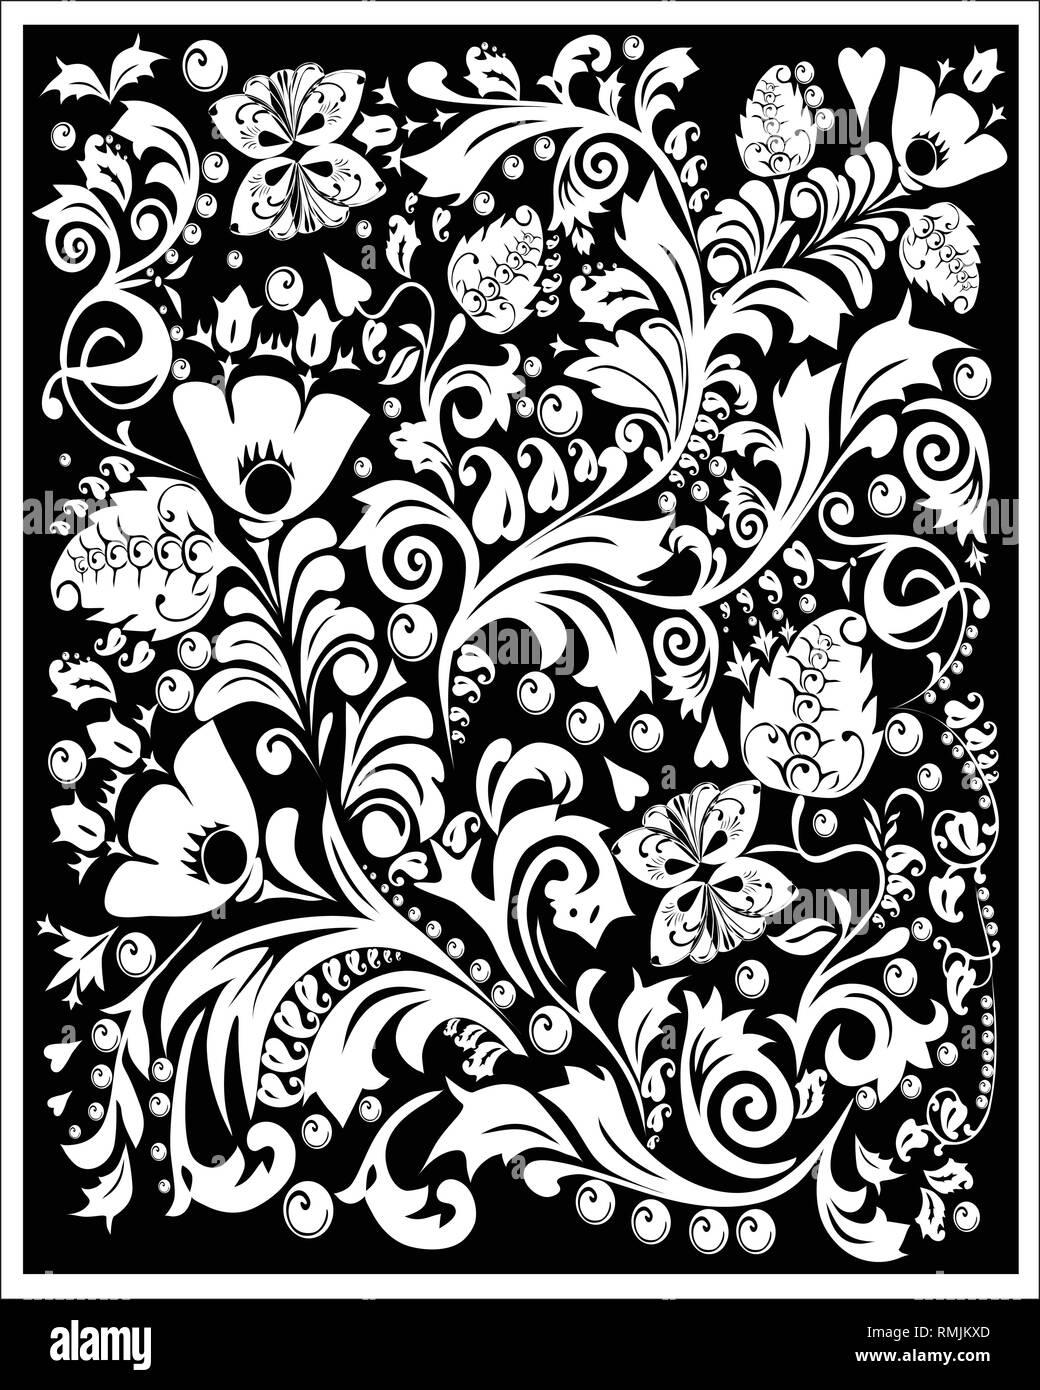 Batik Sunda Vector : batik, sunda, vector, Batik, Painting, Black, White, Stock, Photos, Images, Alamy